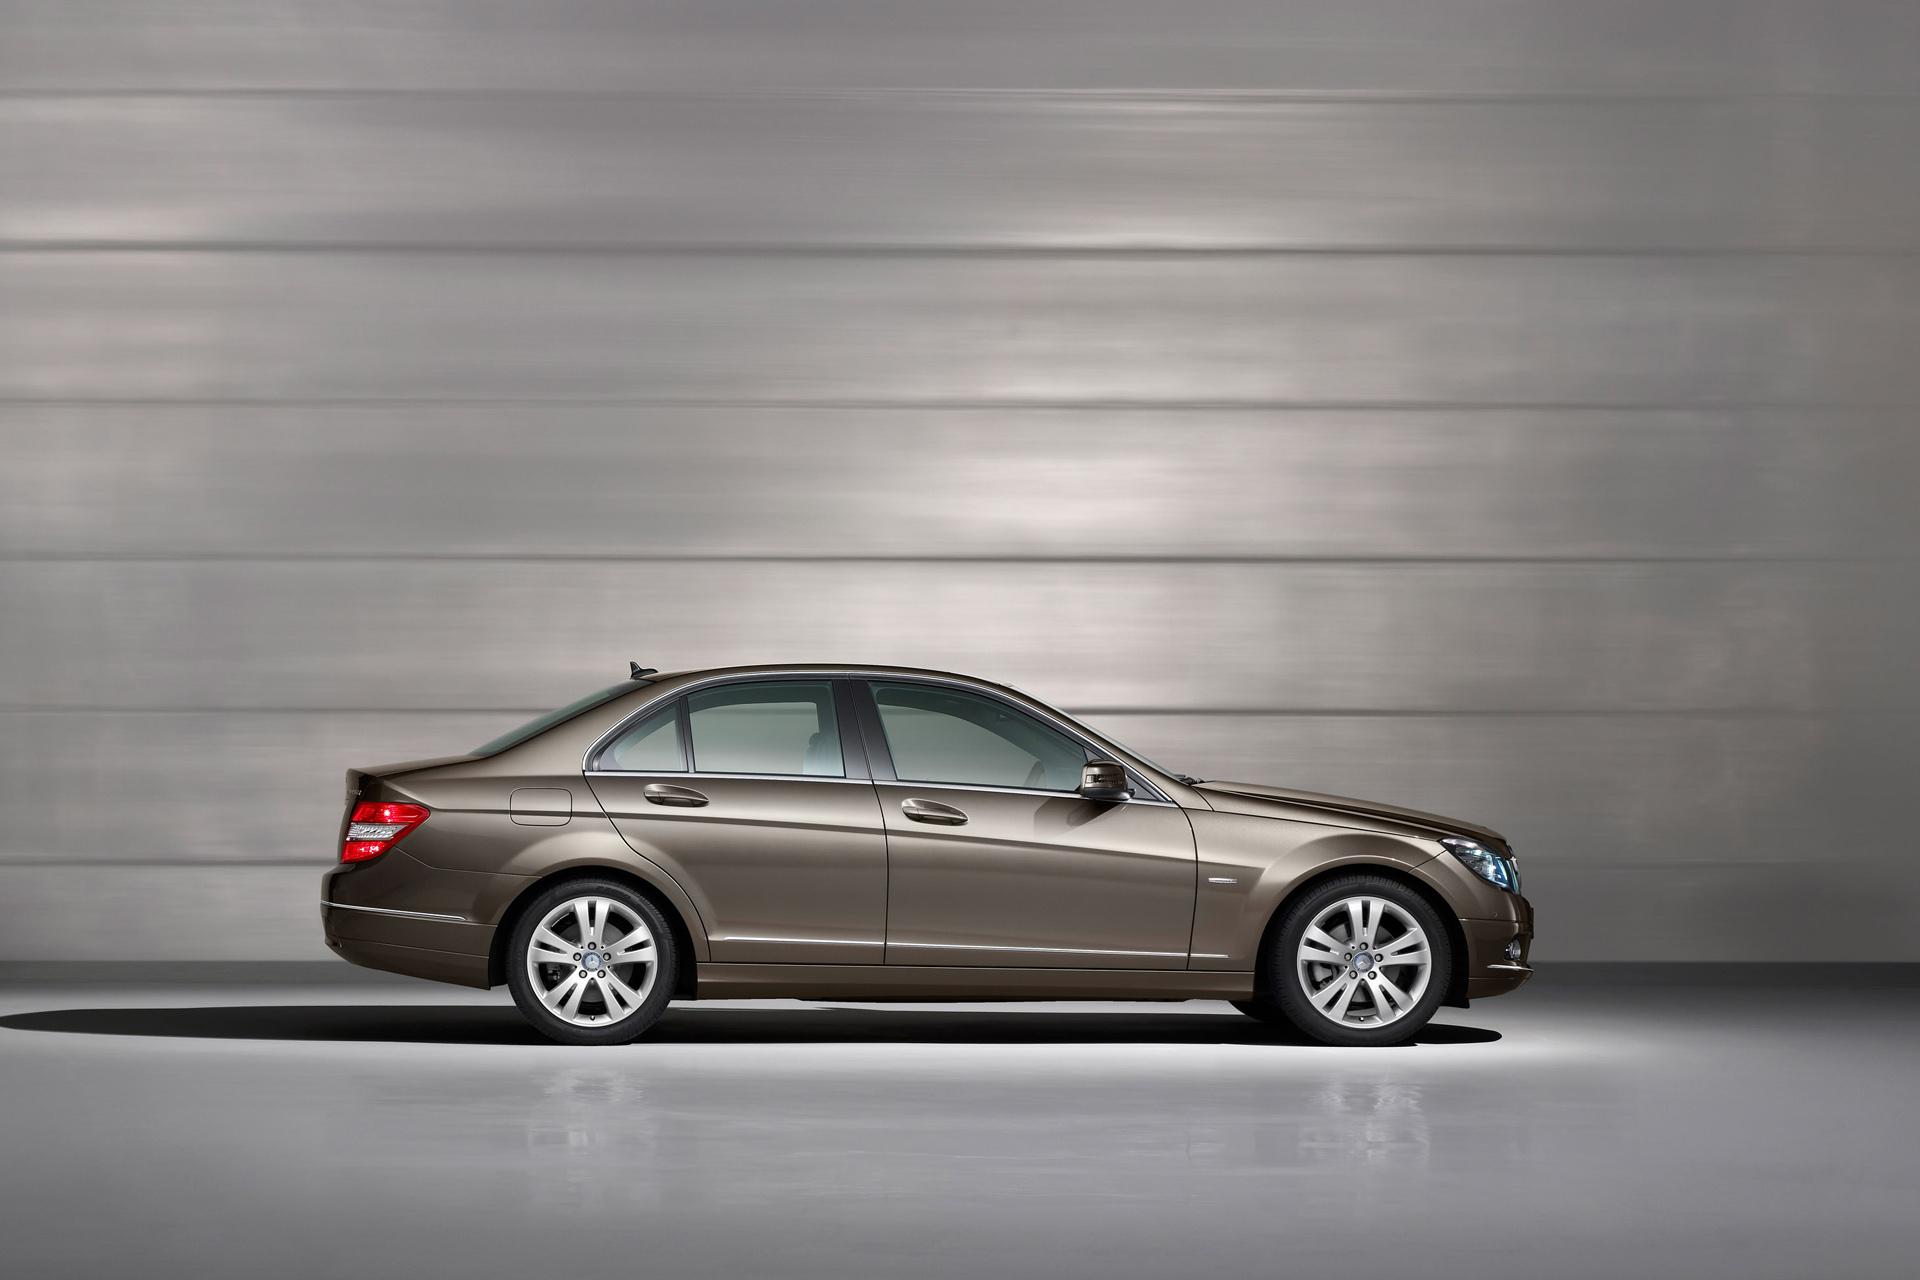 Mercedes-Benz C-Class W204 Picture # 65789